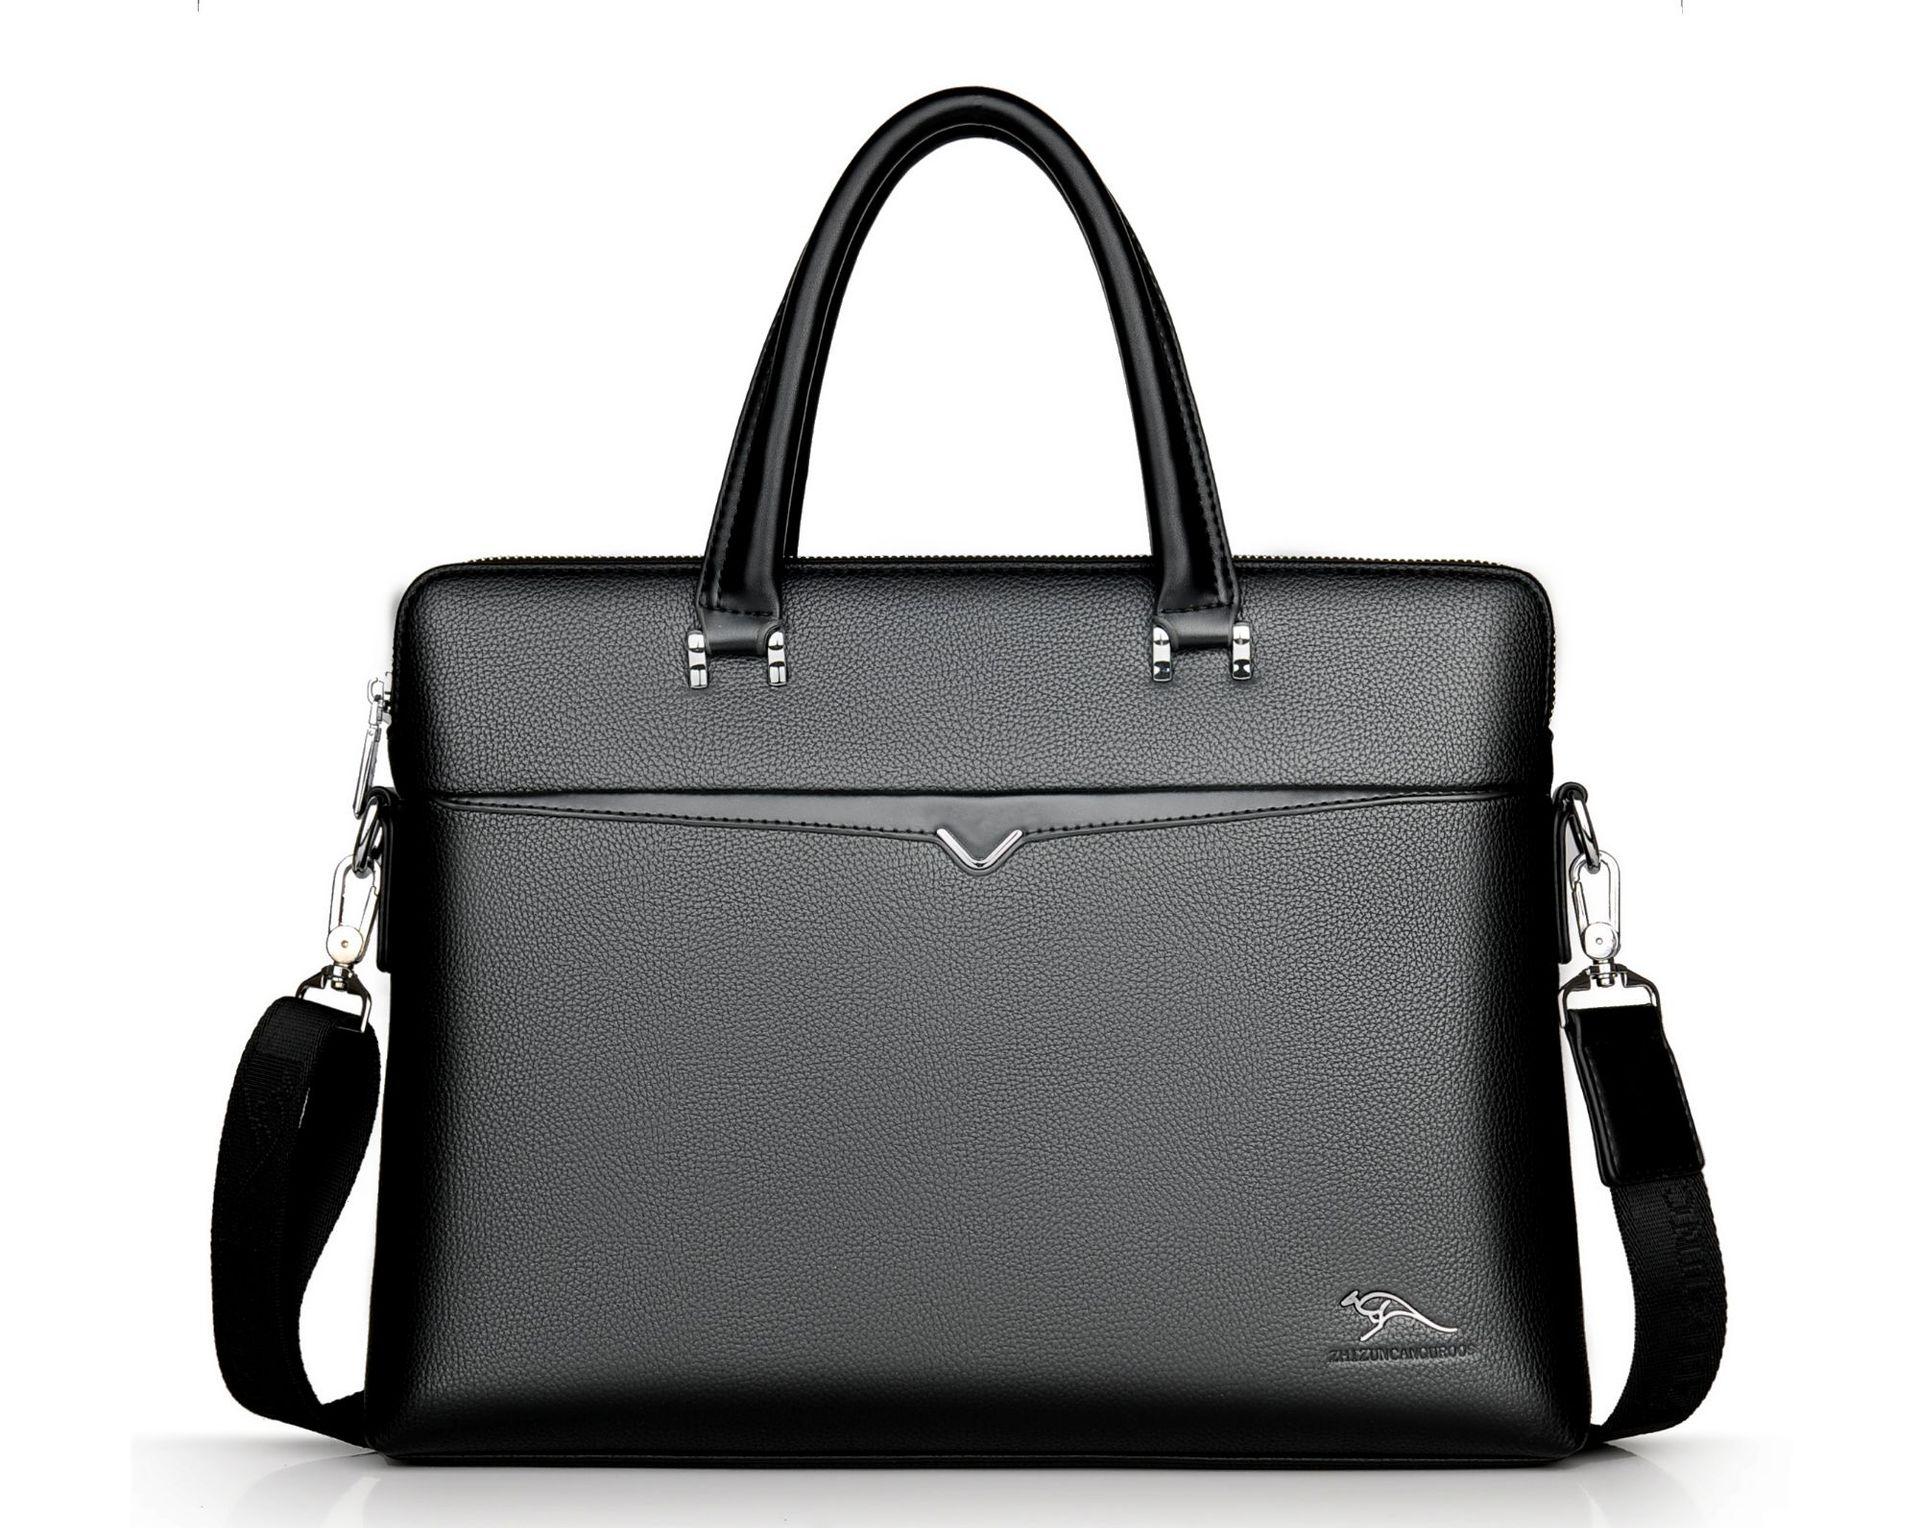 New Luxury Leather Business Men's Briefcase Lager Male Fashion Shoulder Bag Men Messenger Bag Boy Casual Tote Computer Bag